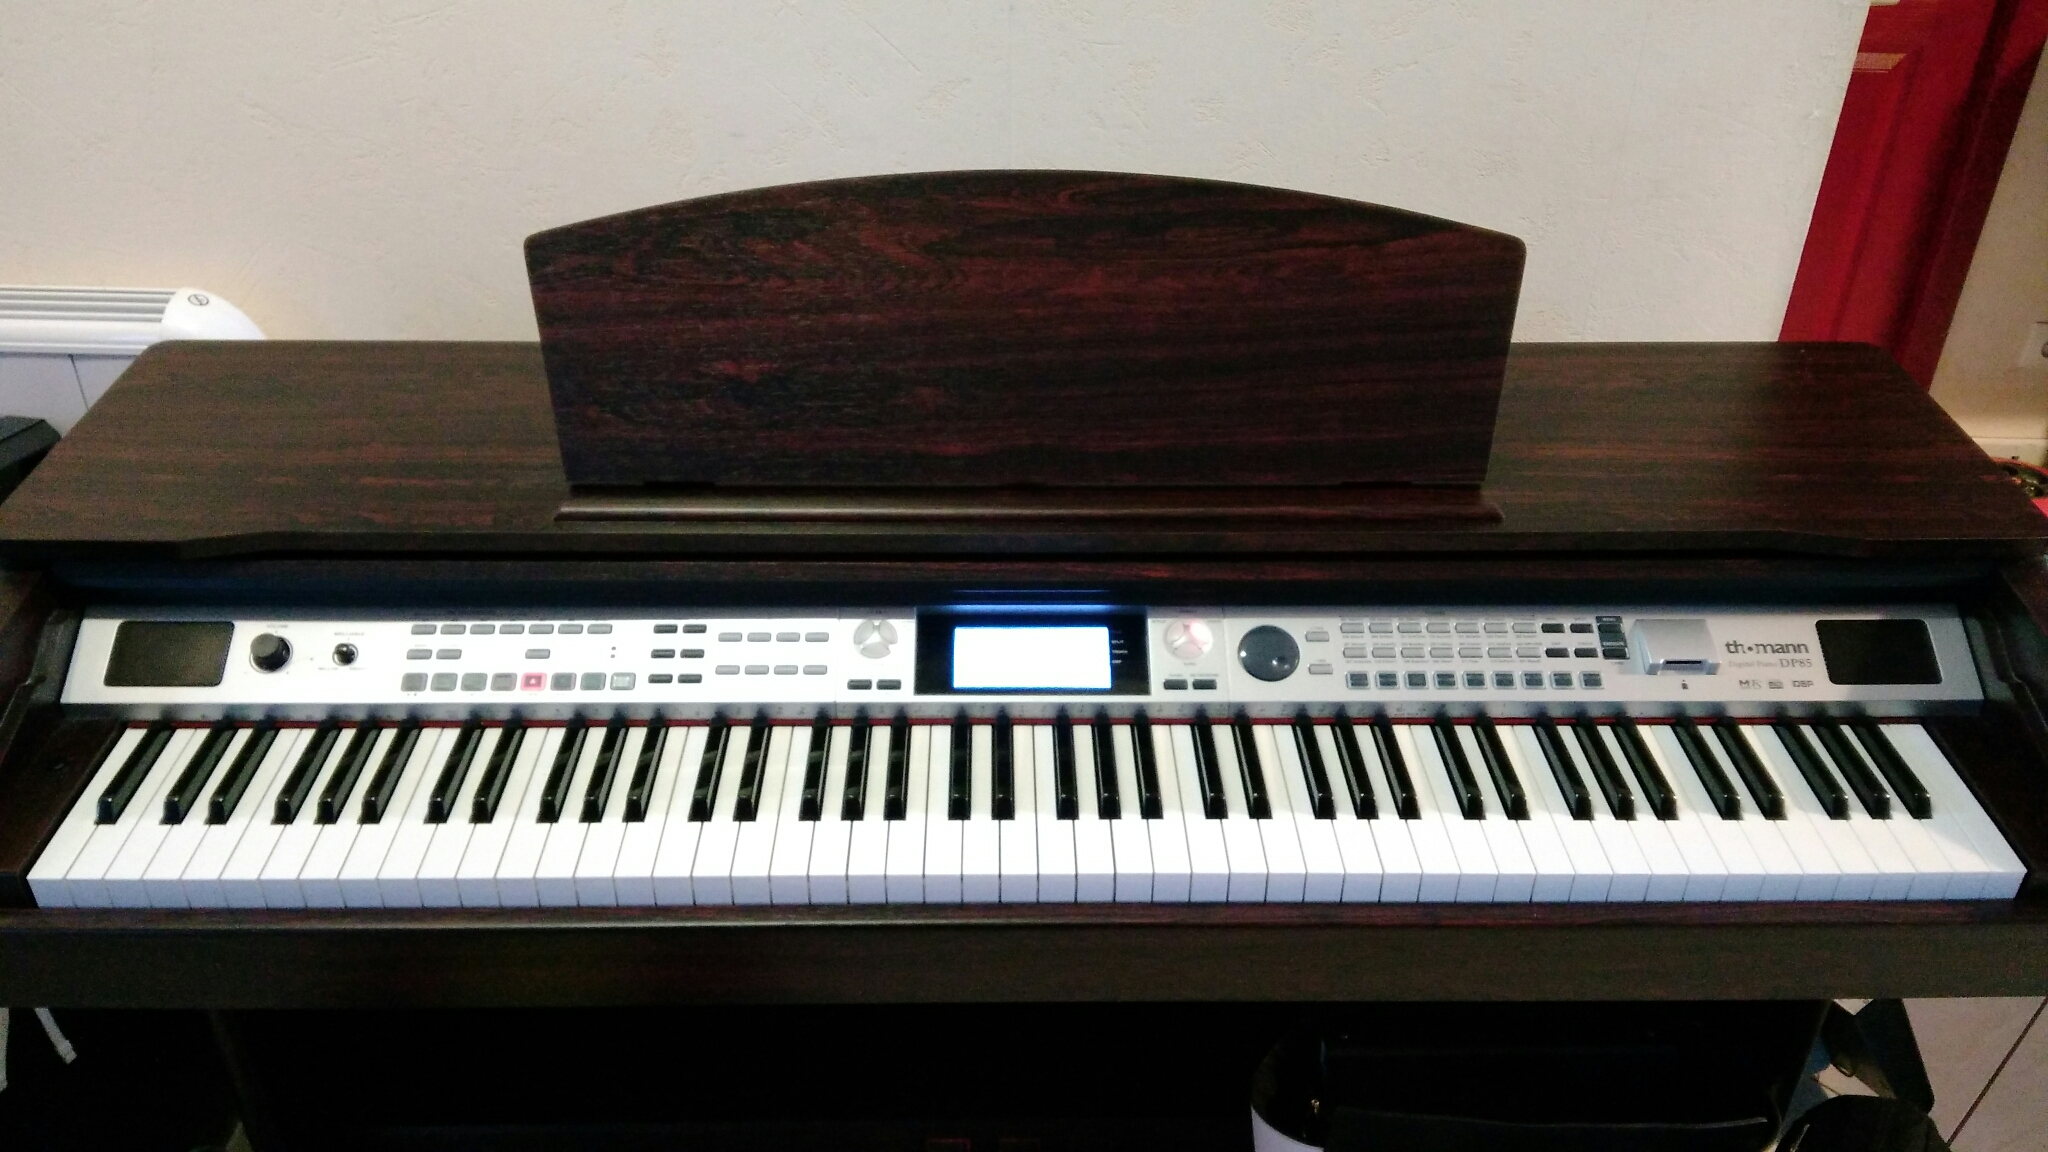 dp 85 arranger thomann dp 85 arranger audiofanzine. Black Bedroom Furniture Sets. Home Design Ideas